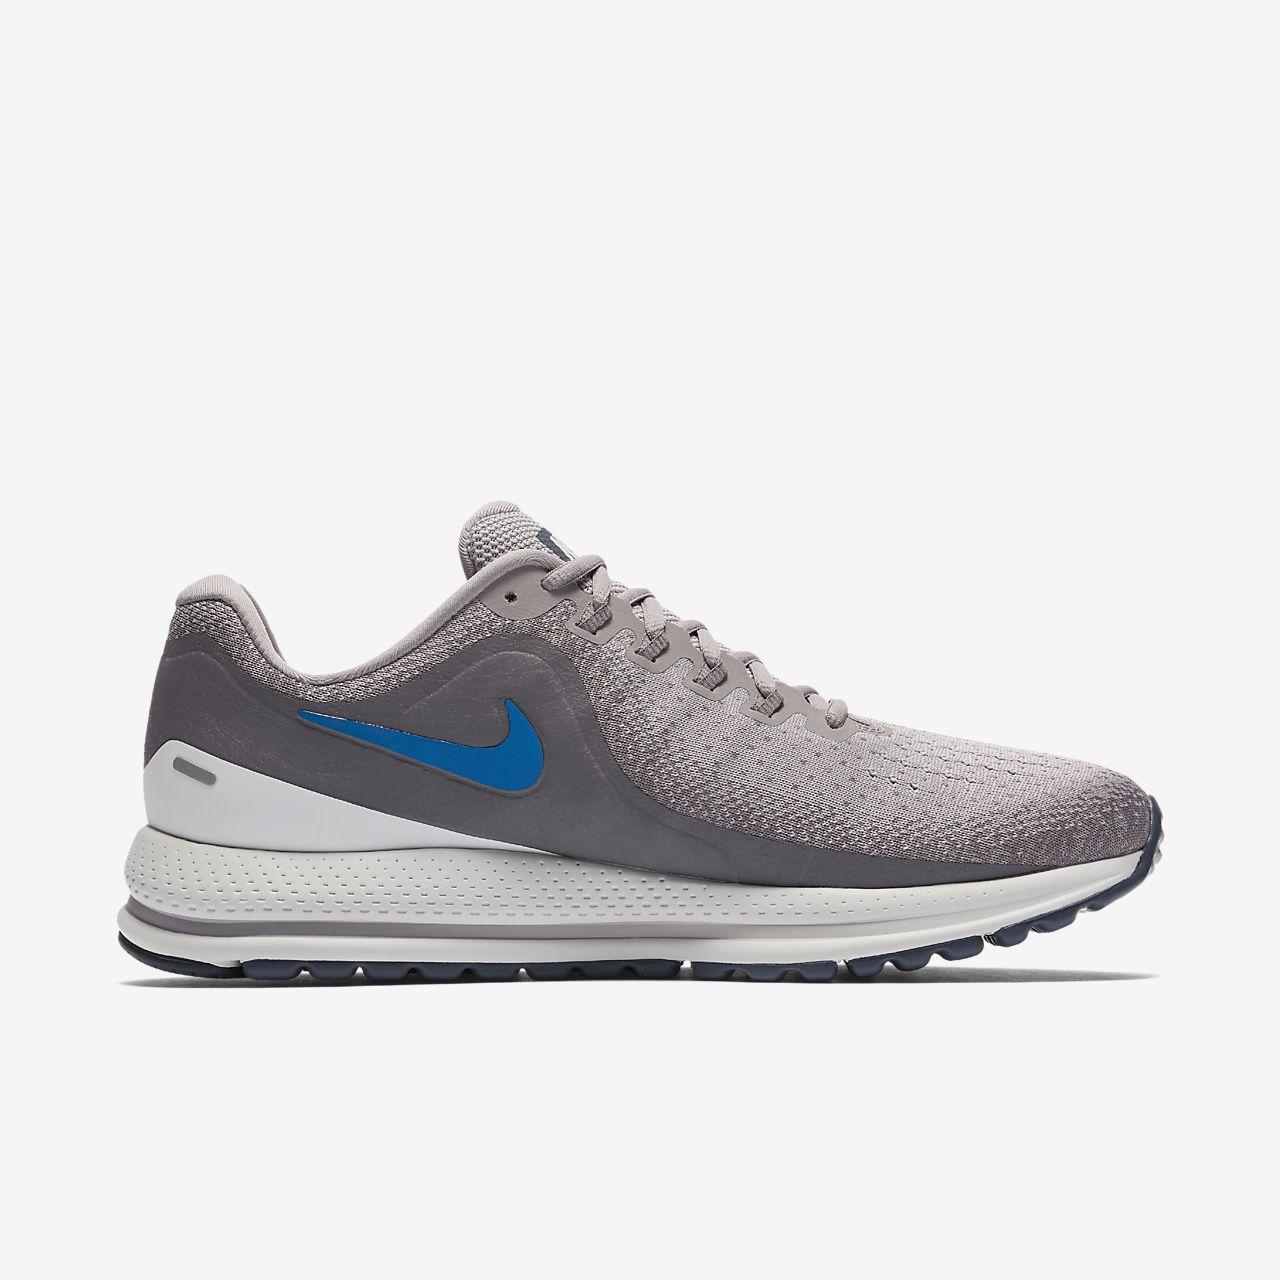 Air Zoom Vomero 13 Chaussures De Sport - Gris Nike mpfS8UrgH